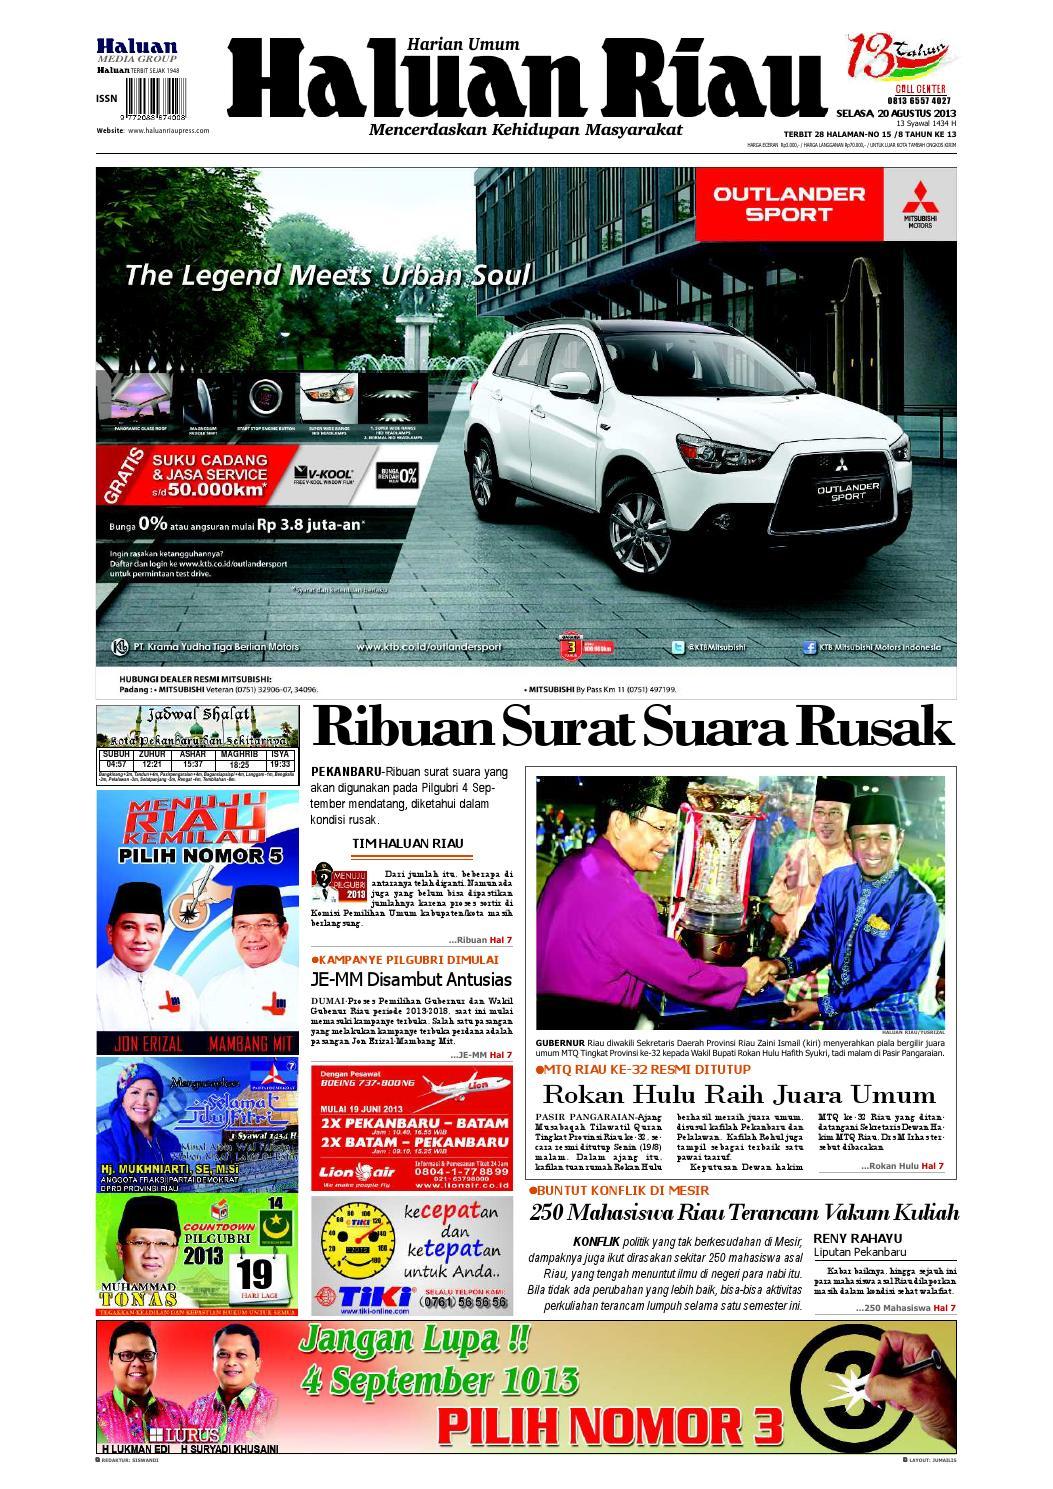 Haluanriau 2013 08 20 By Haluan Riau Issuu Produk Ukm Bumn Tekiro Tang Buaya 10